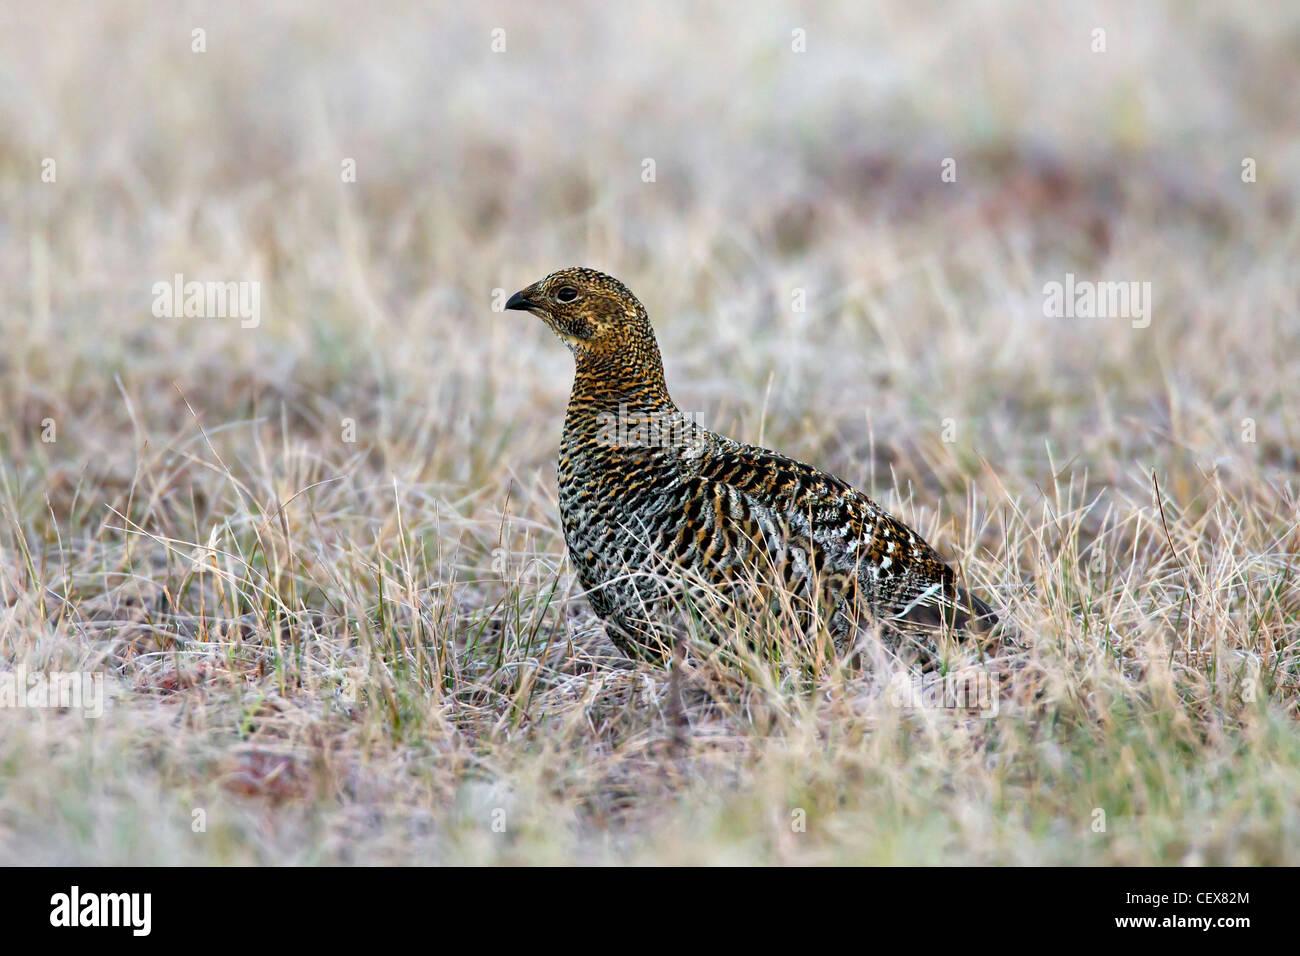 Black grouse (Lyrurus tetrix / Tetrao tetrix) female in grassland - Stock Image